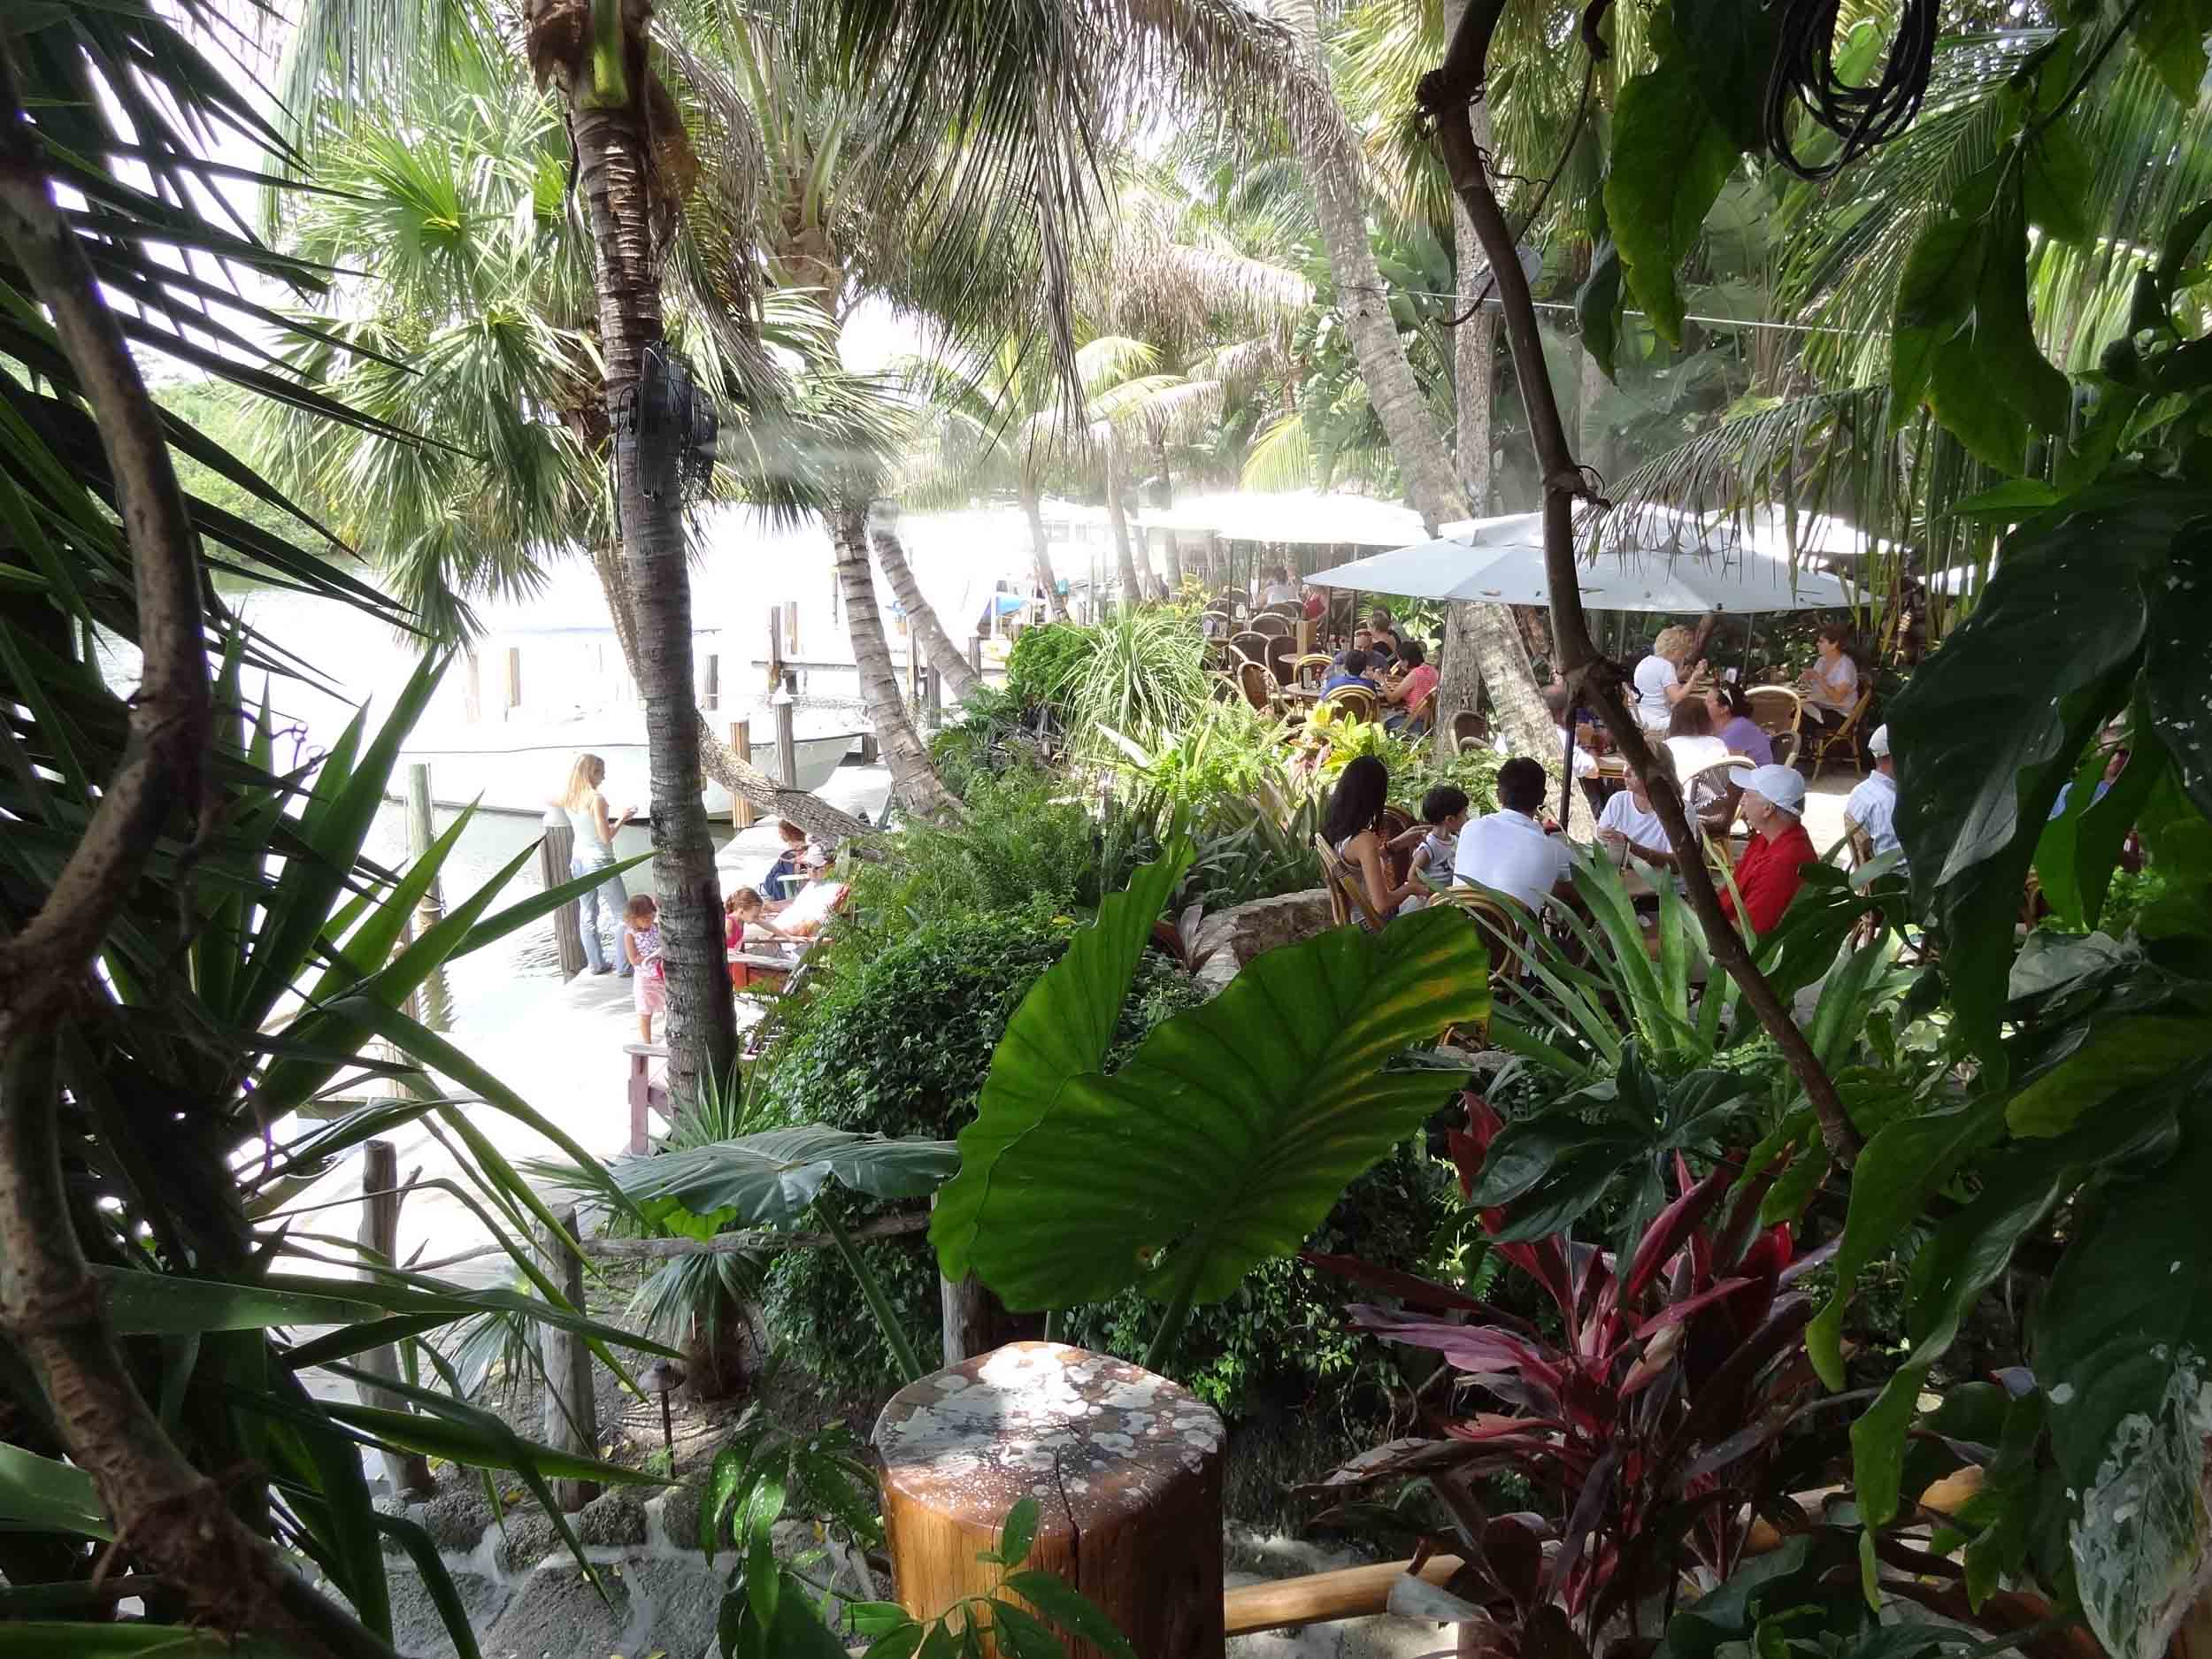 Guanabanas Seating Area